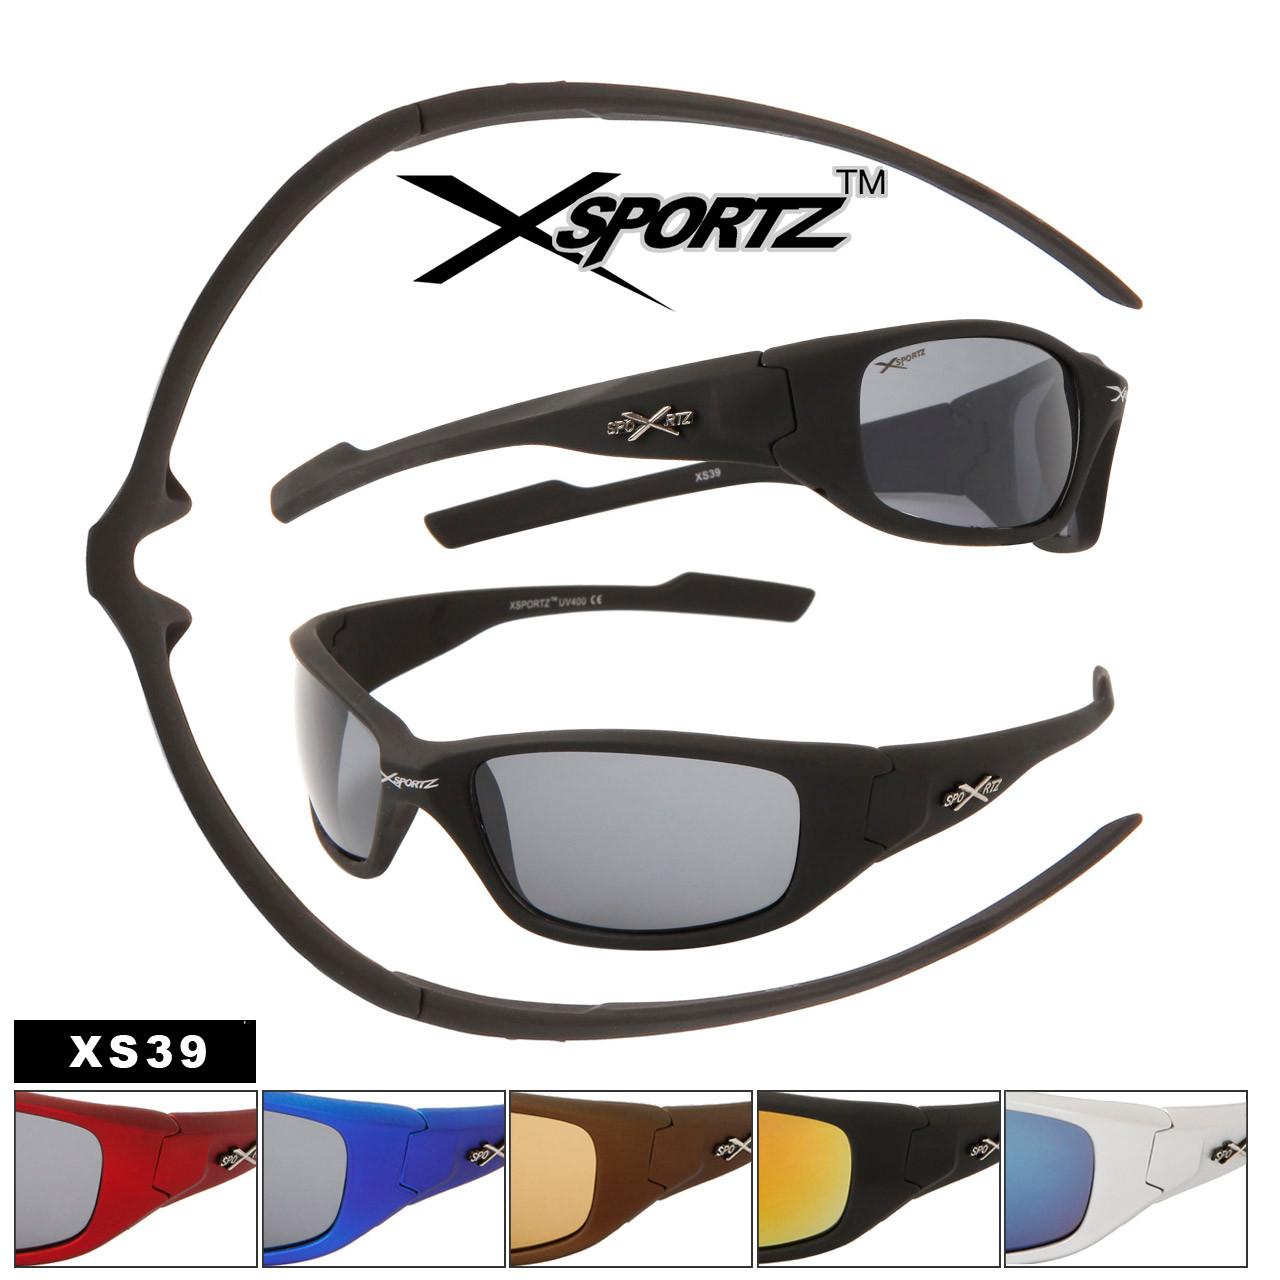 Xsportz™ Sports Sunglasses XS39